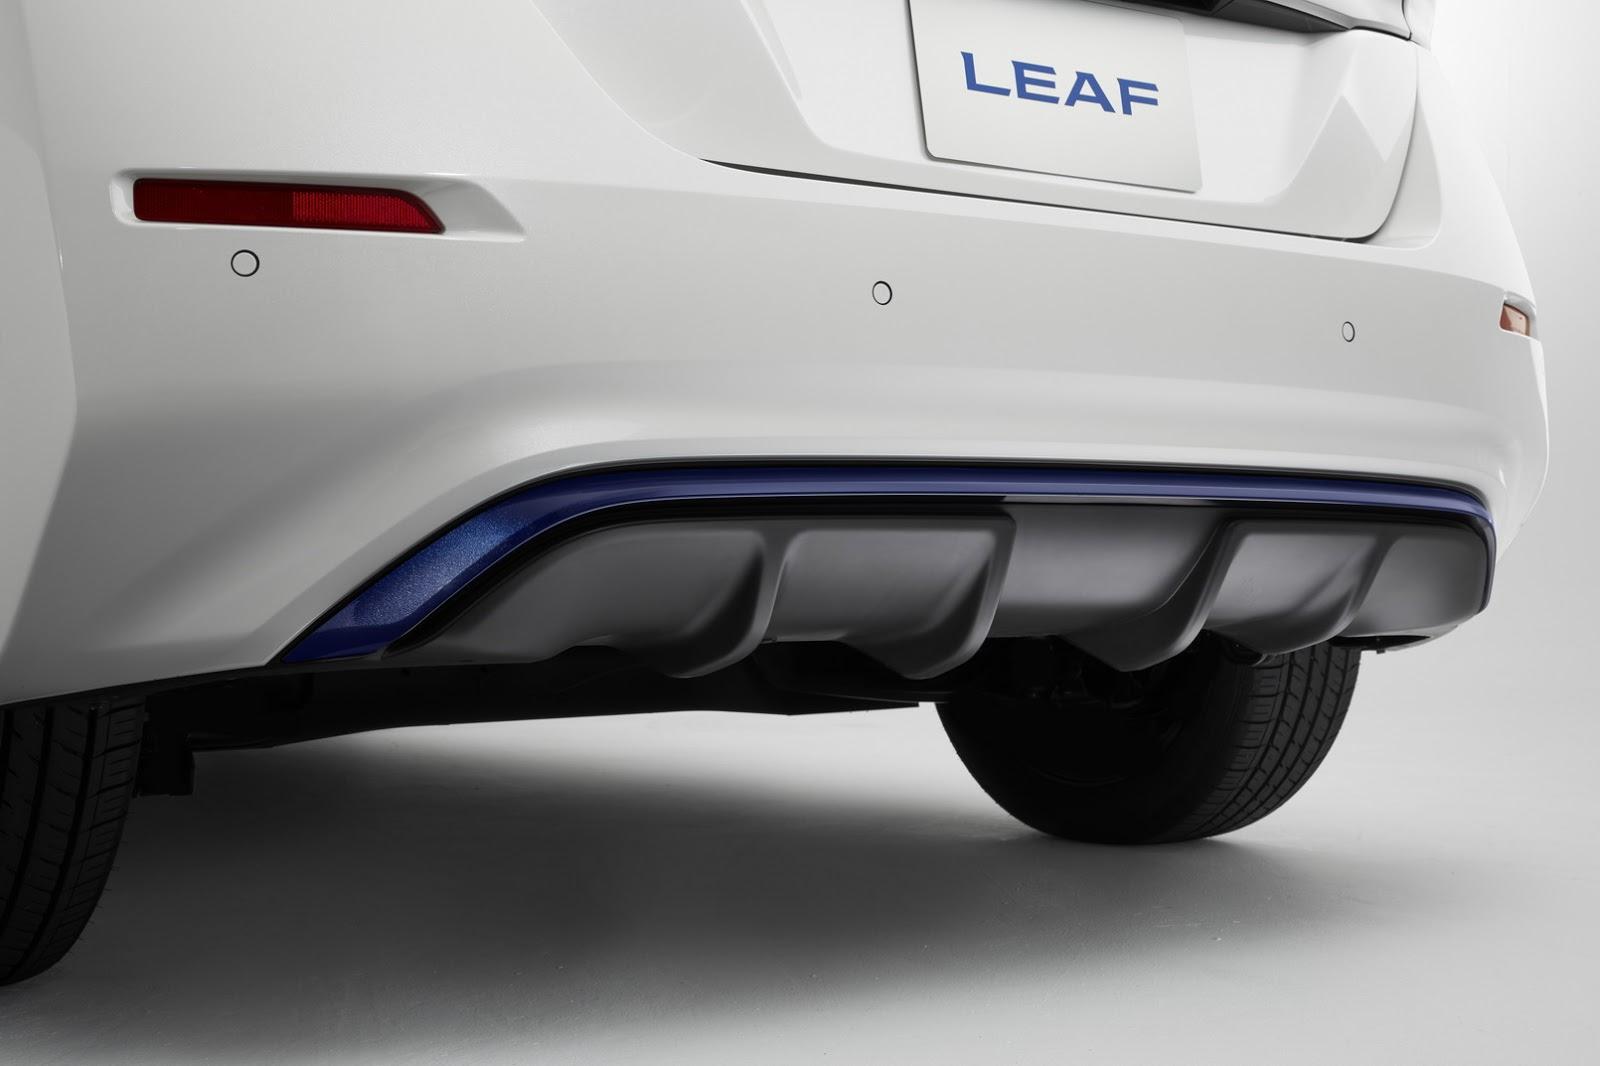 Nissan Leaf 2018 EU (18)